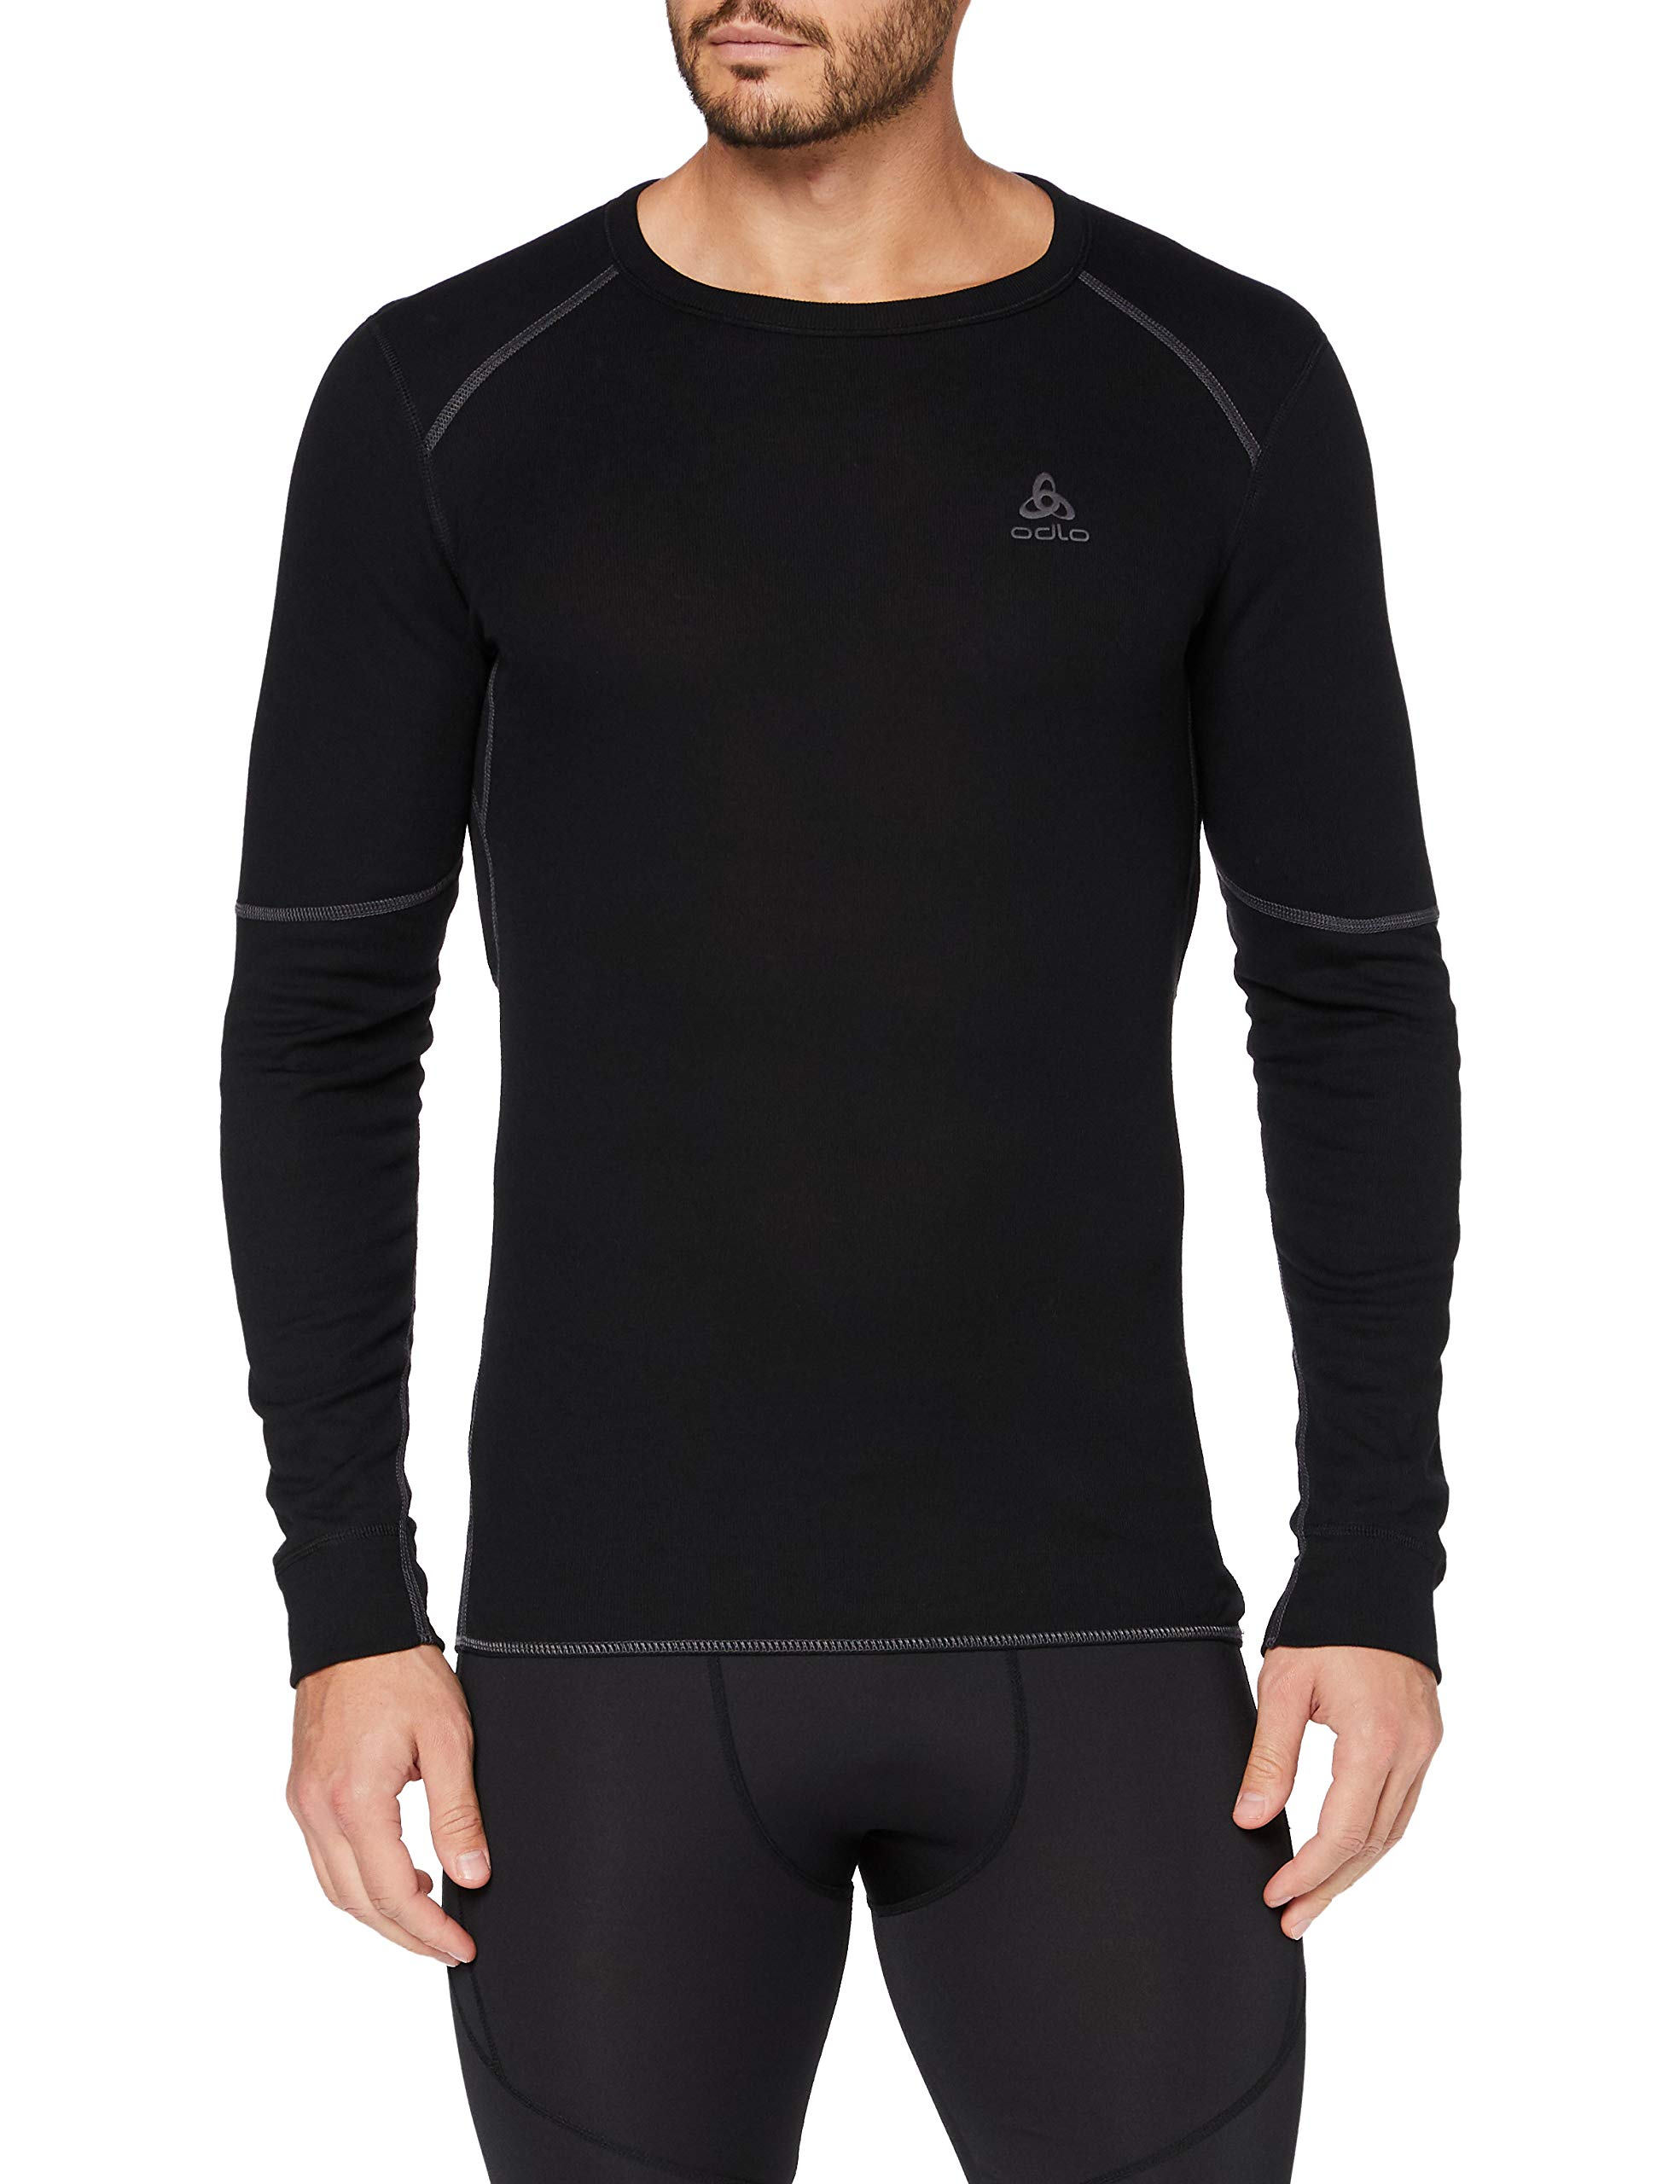 Odlo Herren Shirt Long Sleeve Crew Neck X-warm Unterhemd, Schwarz, L EU